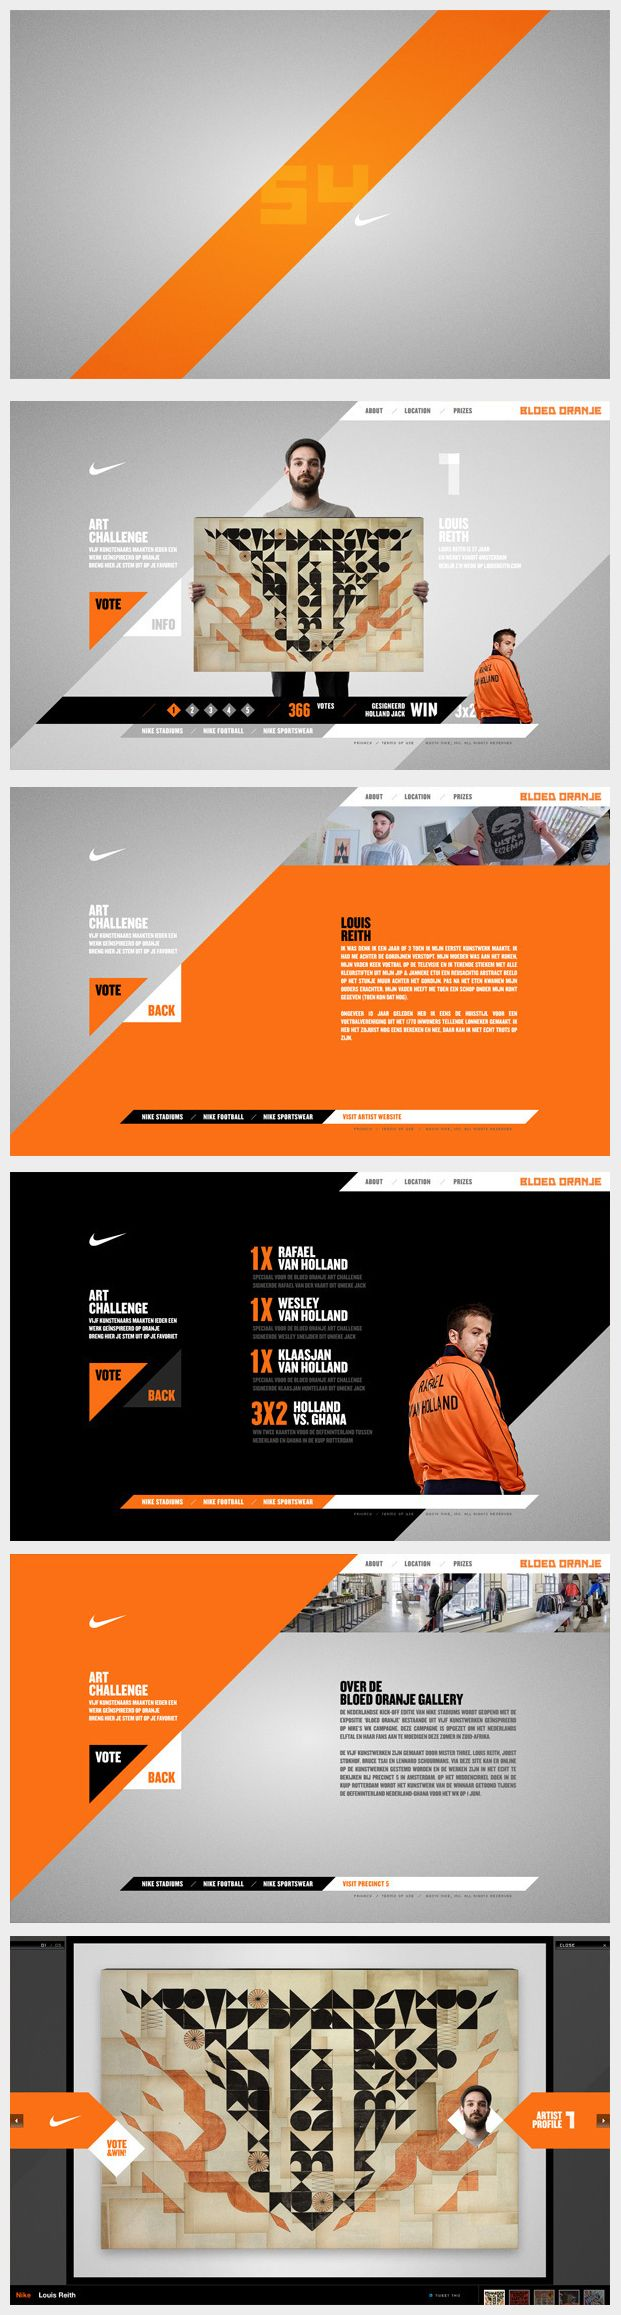 Nike website | Web layout design, Web app design